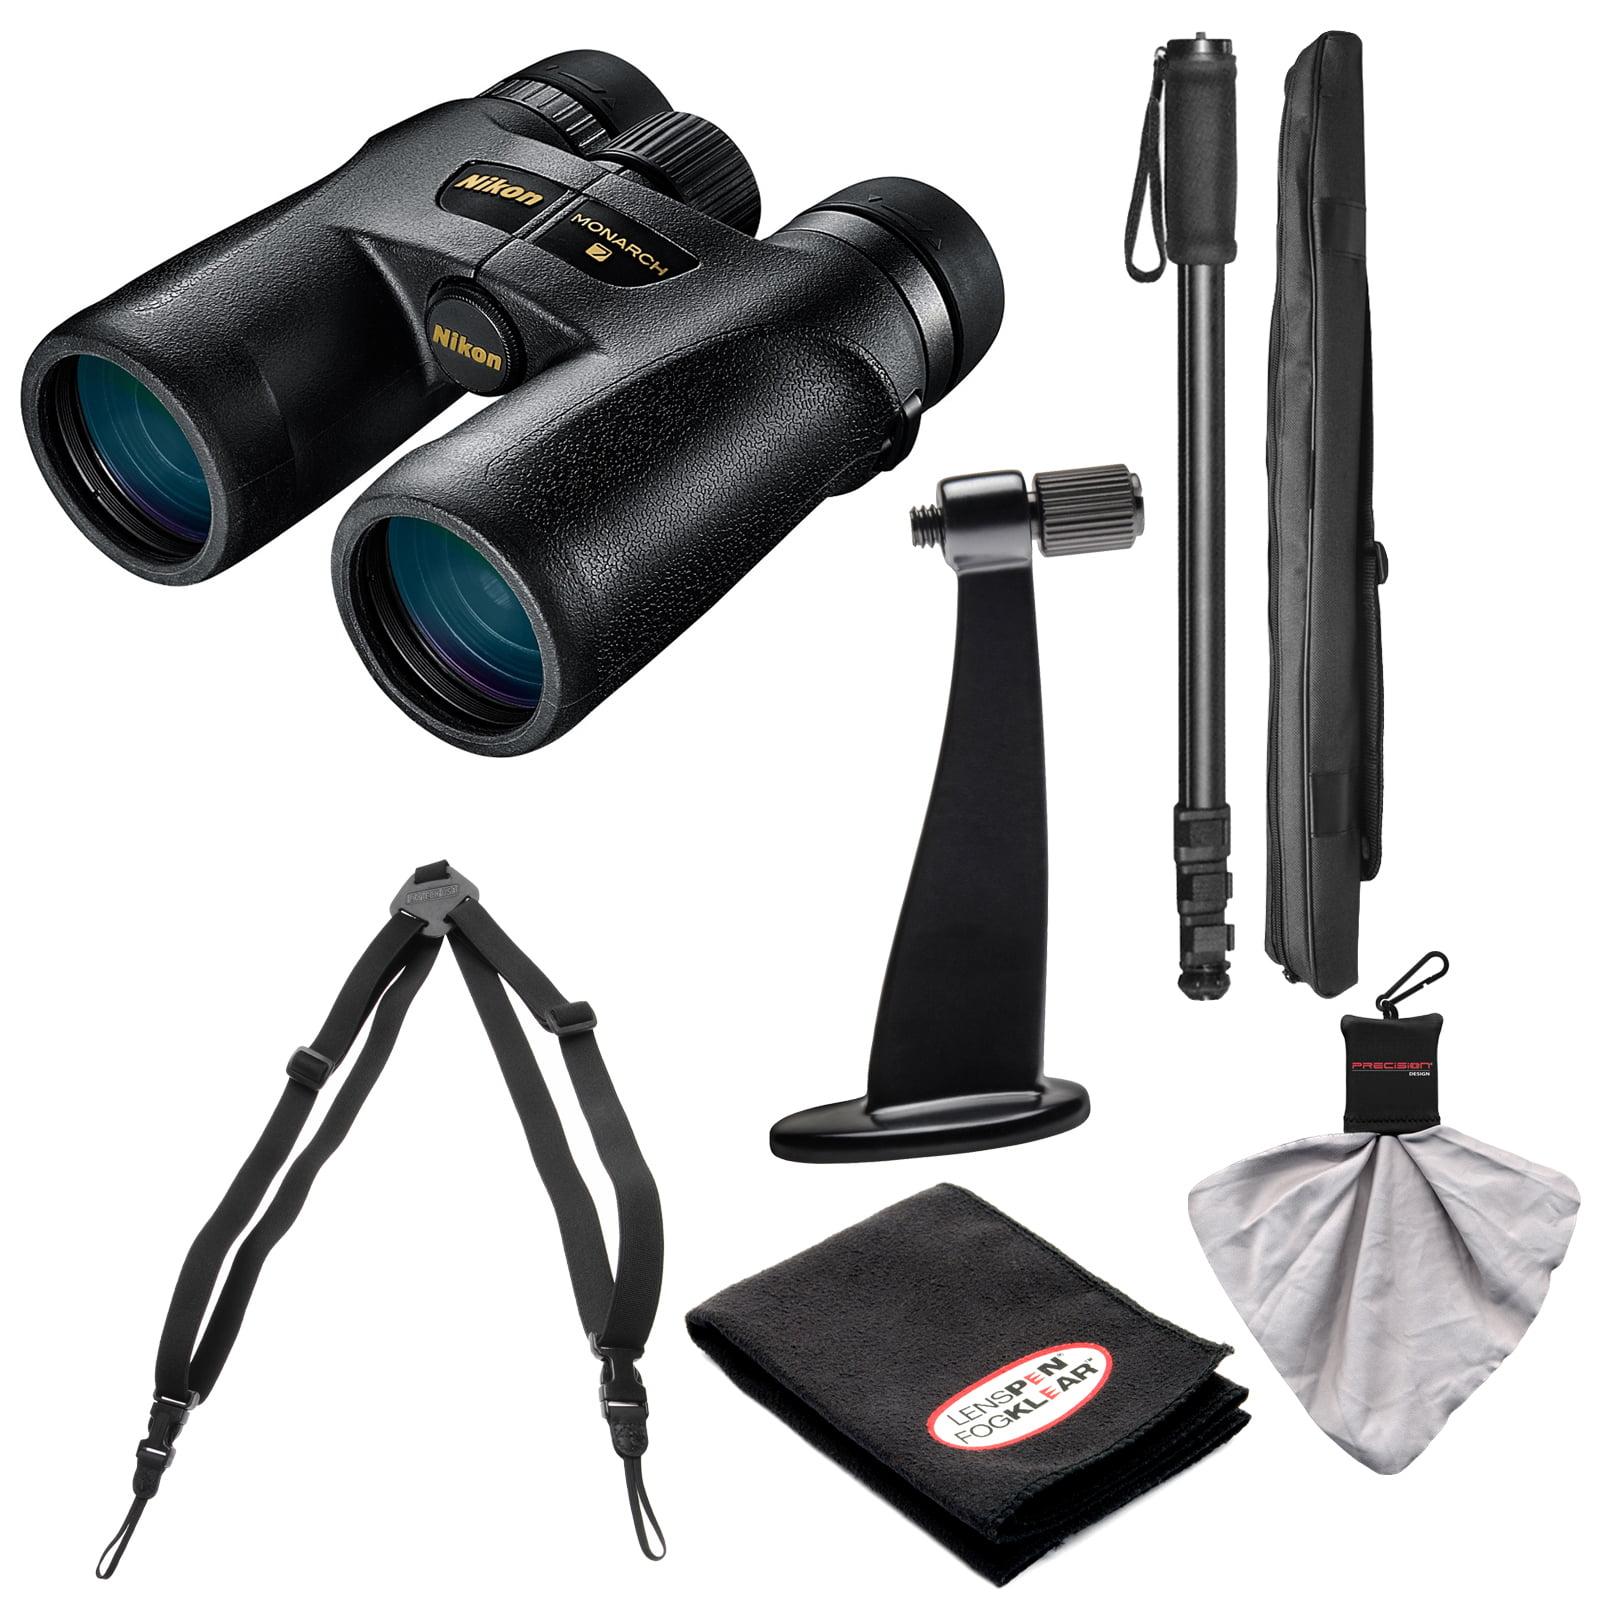 Nikon Monarch 7 8x42 ED ATB Waterproof/Fogproof Binoculars with Case + Harness + Tripod Adapter & Monopod + Kit